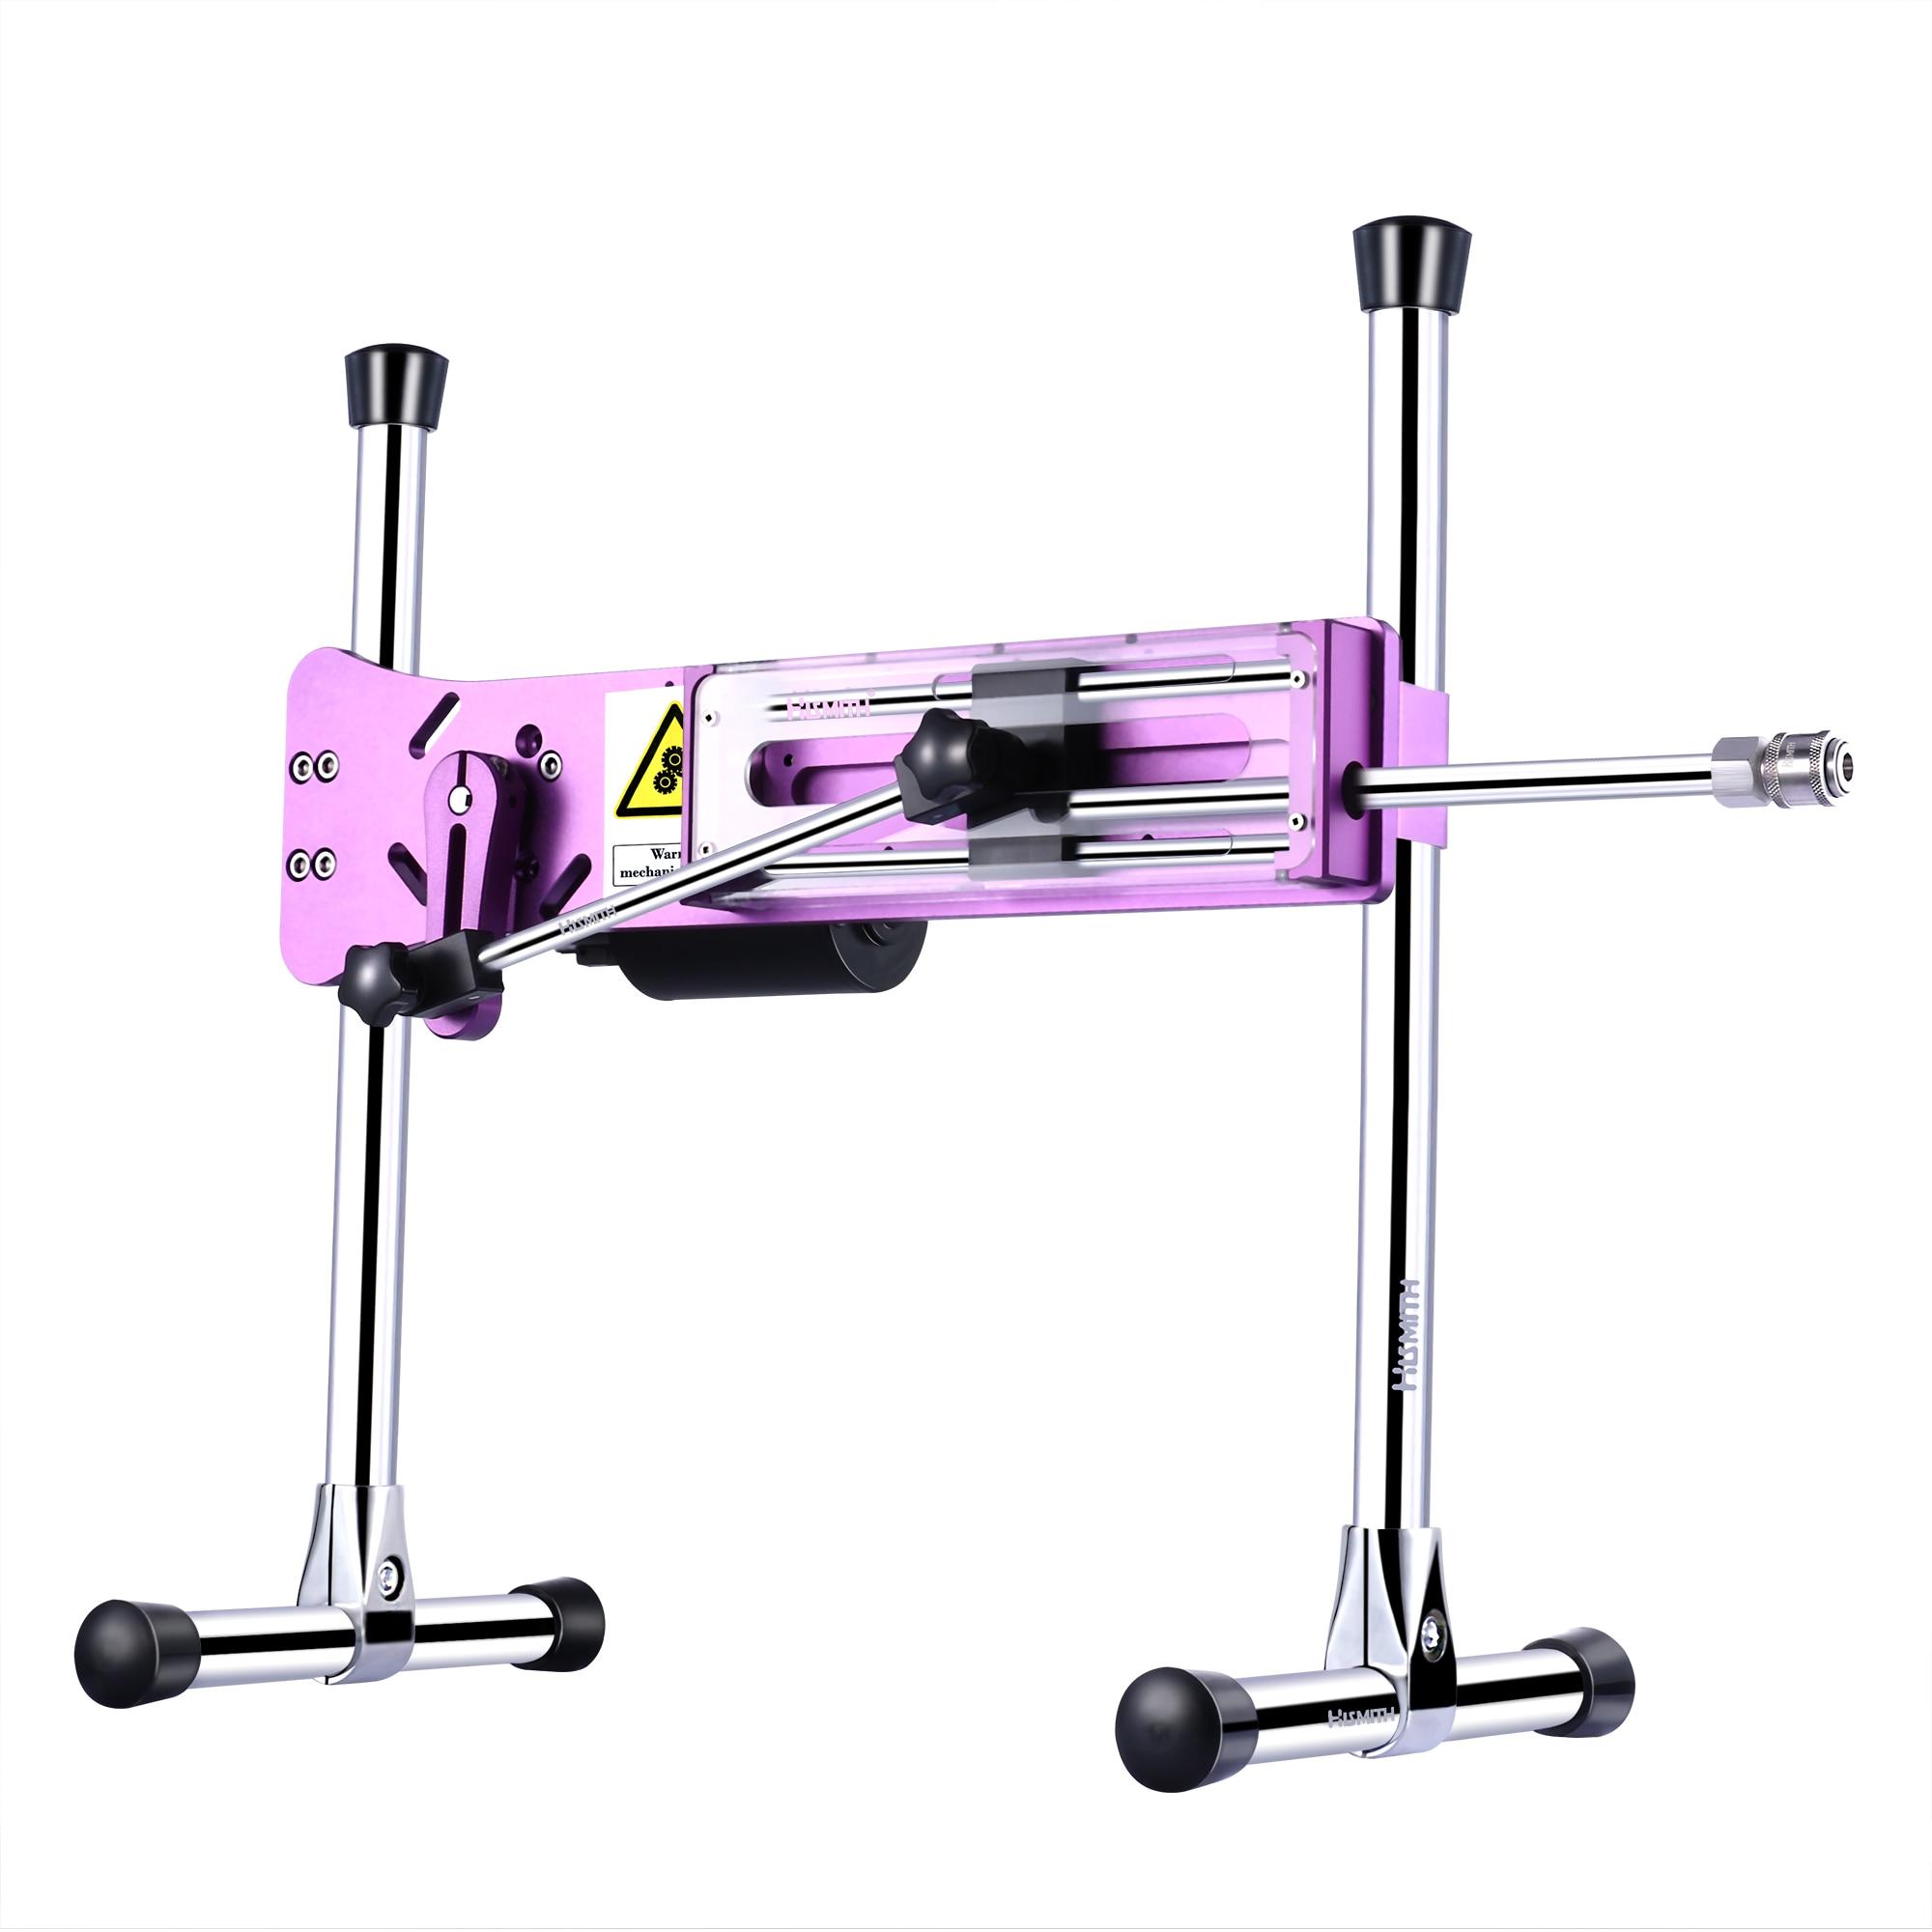 Hismith Premium Sex Machine With 8 quot Silicone Dildo Purple Thrusting Machines KlicLok System Love Machine Gun for Women in Masturbation Machine from Beauty amp Health